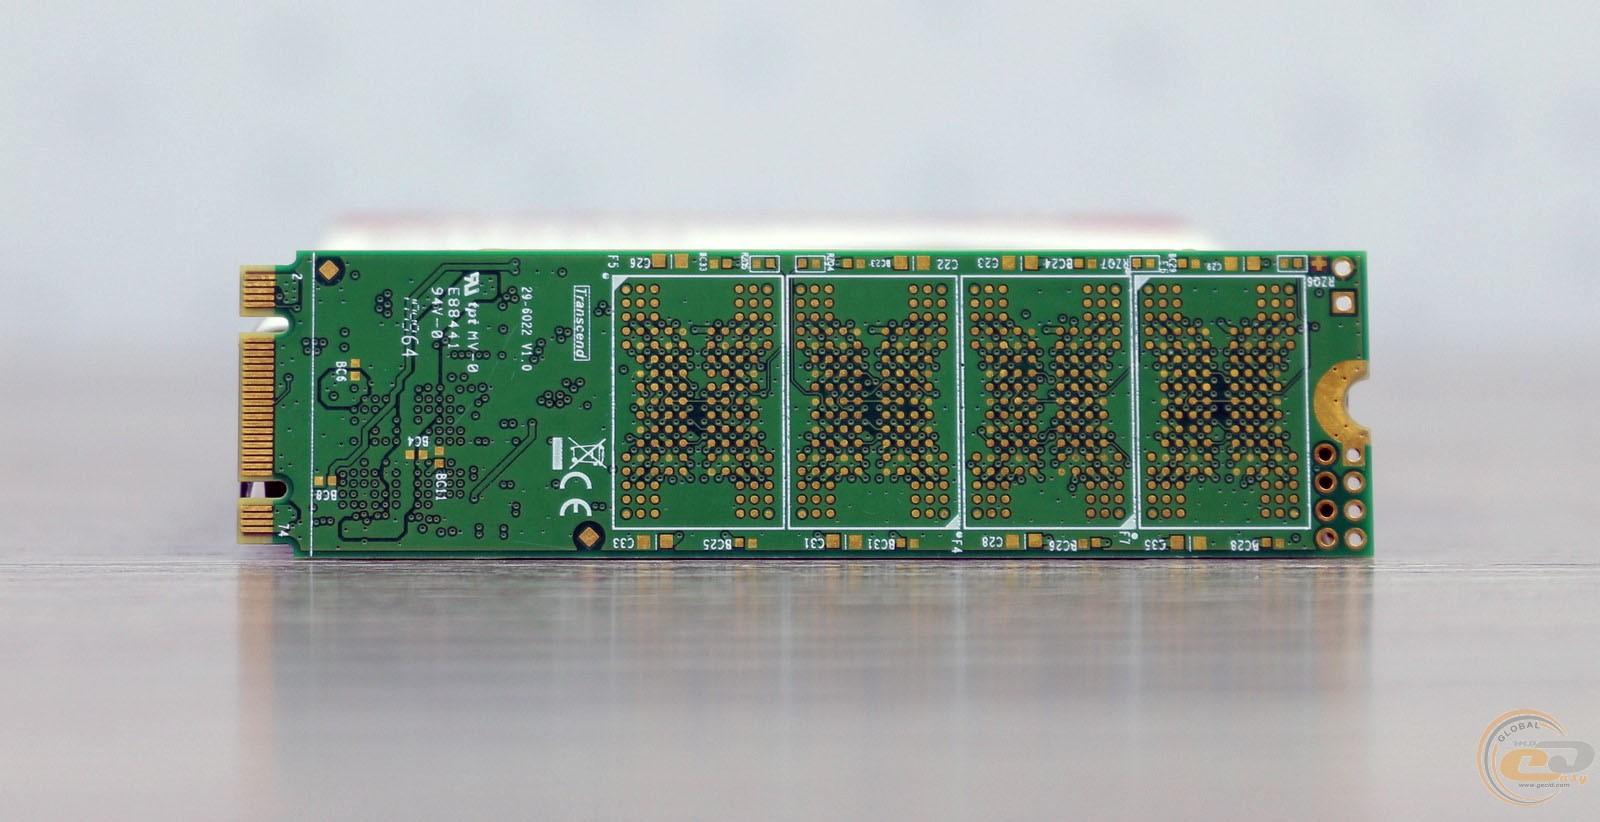 Обзор и тестирование SSD Transcend MTS820S объемом 120 ГБ и